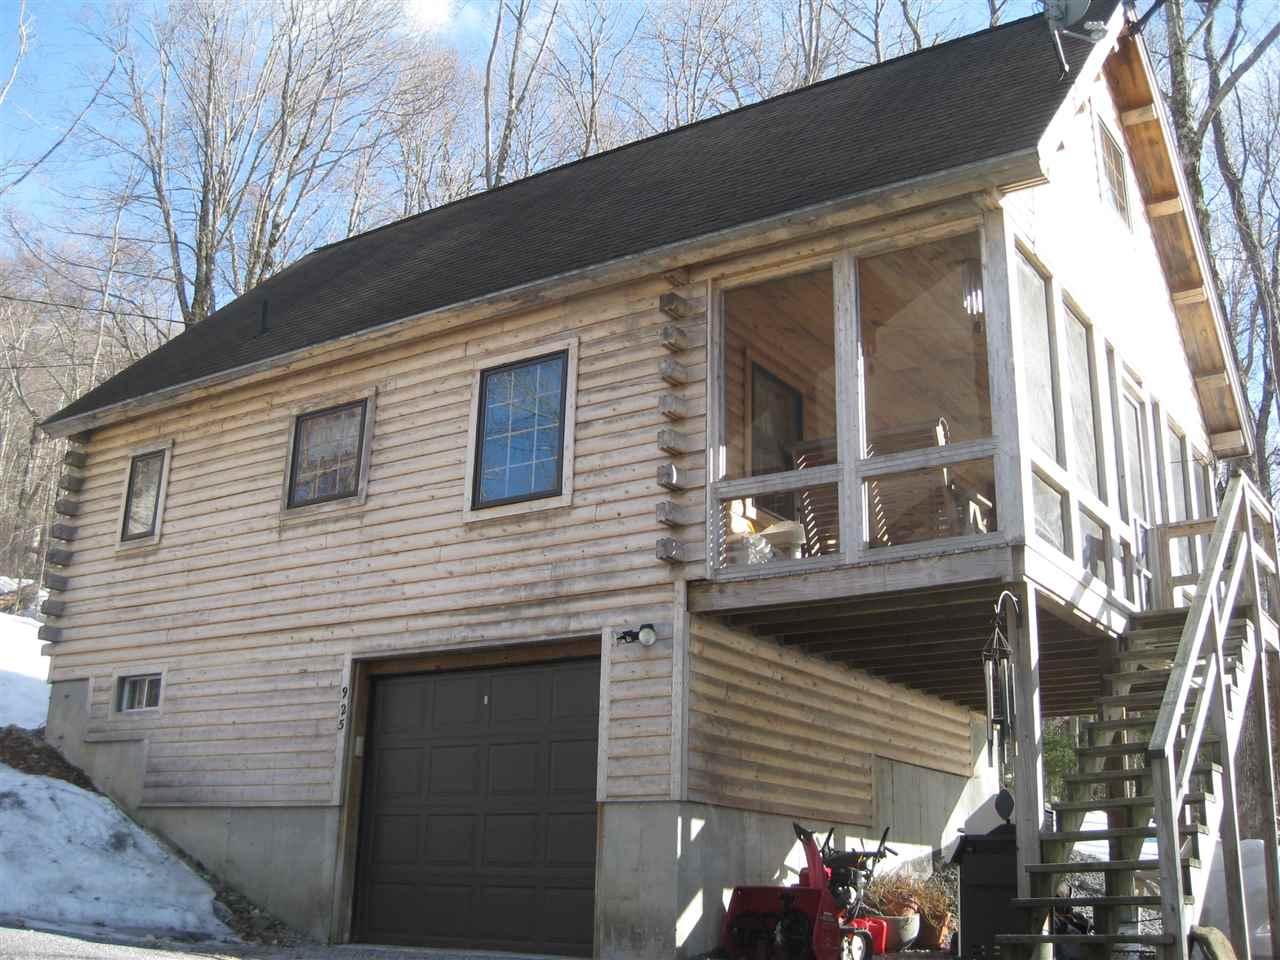 Mount-Snow-Real-Estate-4623147-21